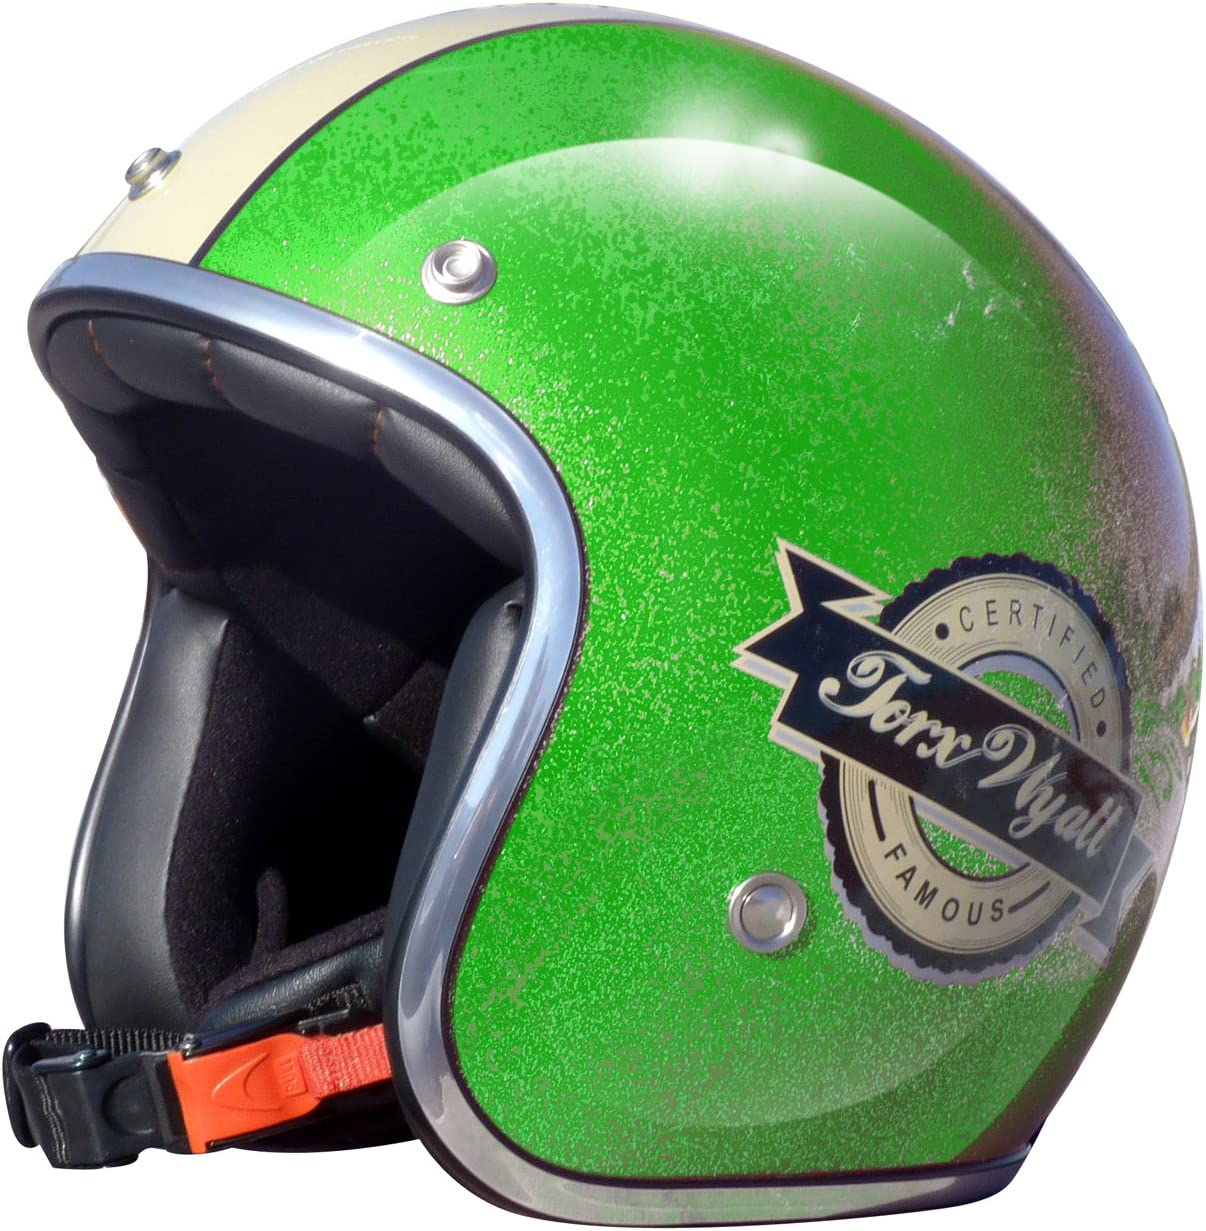 TORX Casque Moto WYATT FAMOUS SHINY GLITTER PINK Taille XS Rose